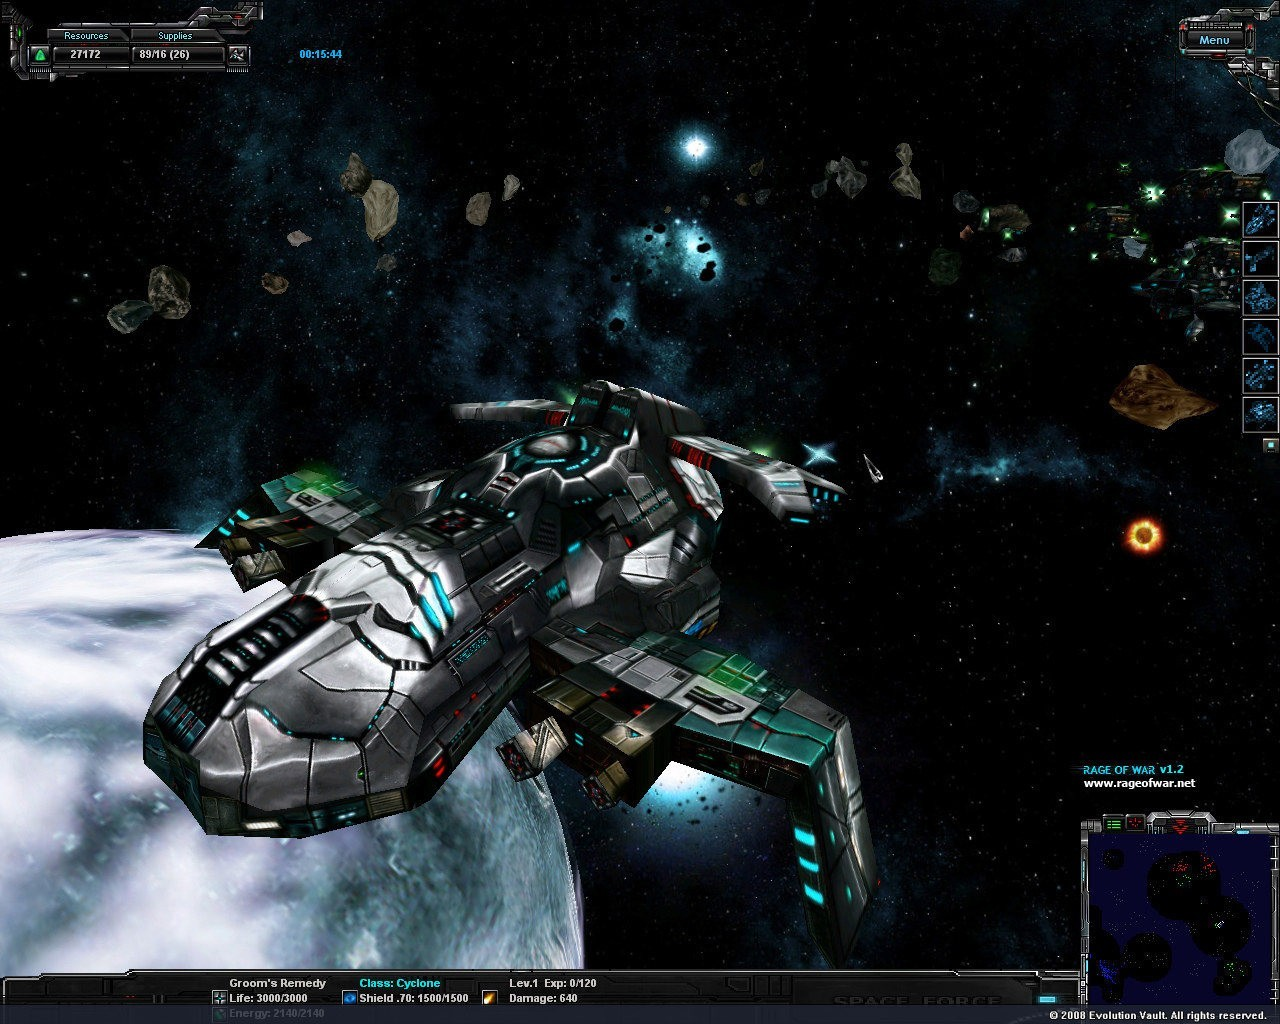 Galactic Dream: Rage of War Cheats